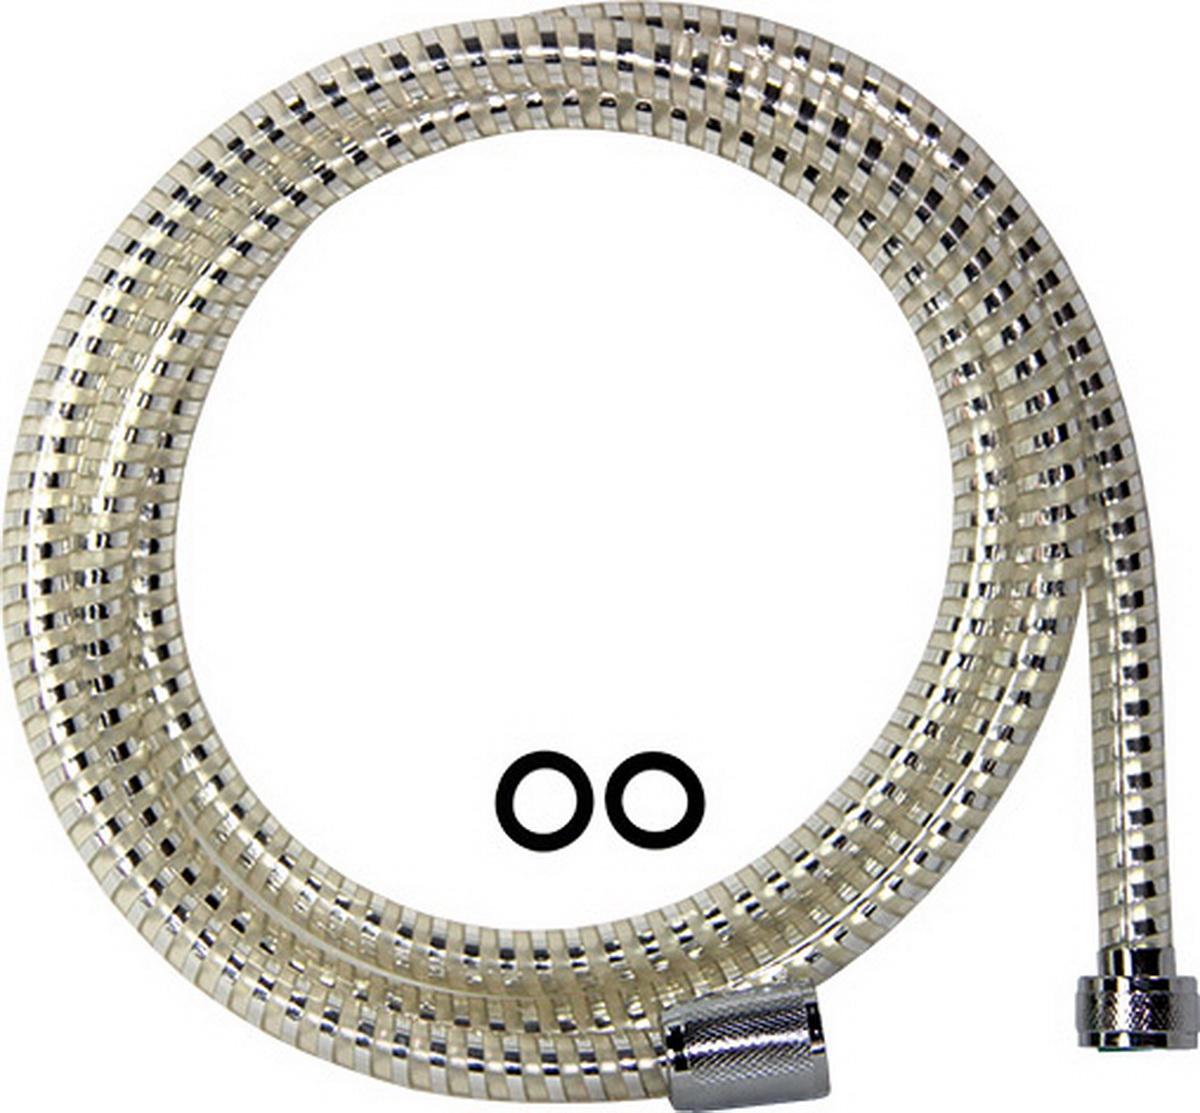 Argo шланг для душа, 1/2, PVC Еspiroflex TRANSPARENTE, 175 см655.01Шланг для душа Argo 1/2, pvc espiroflex transparente, 175 см